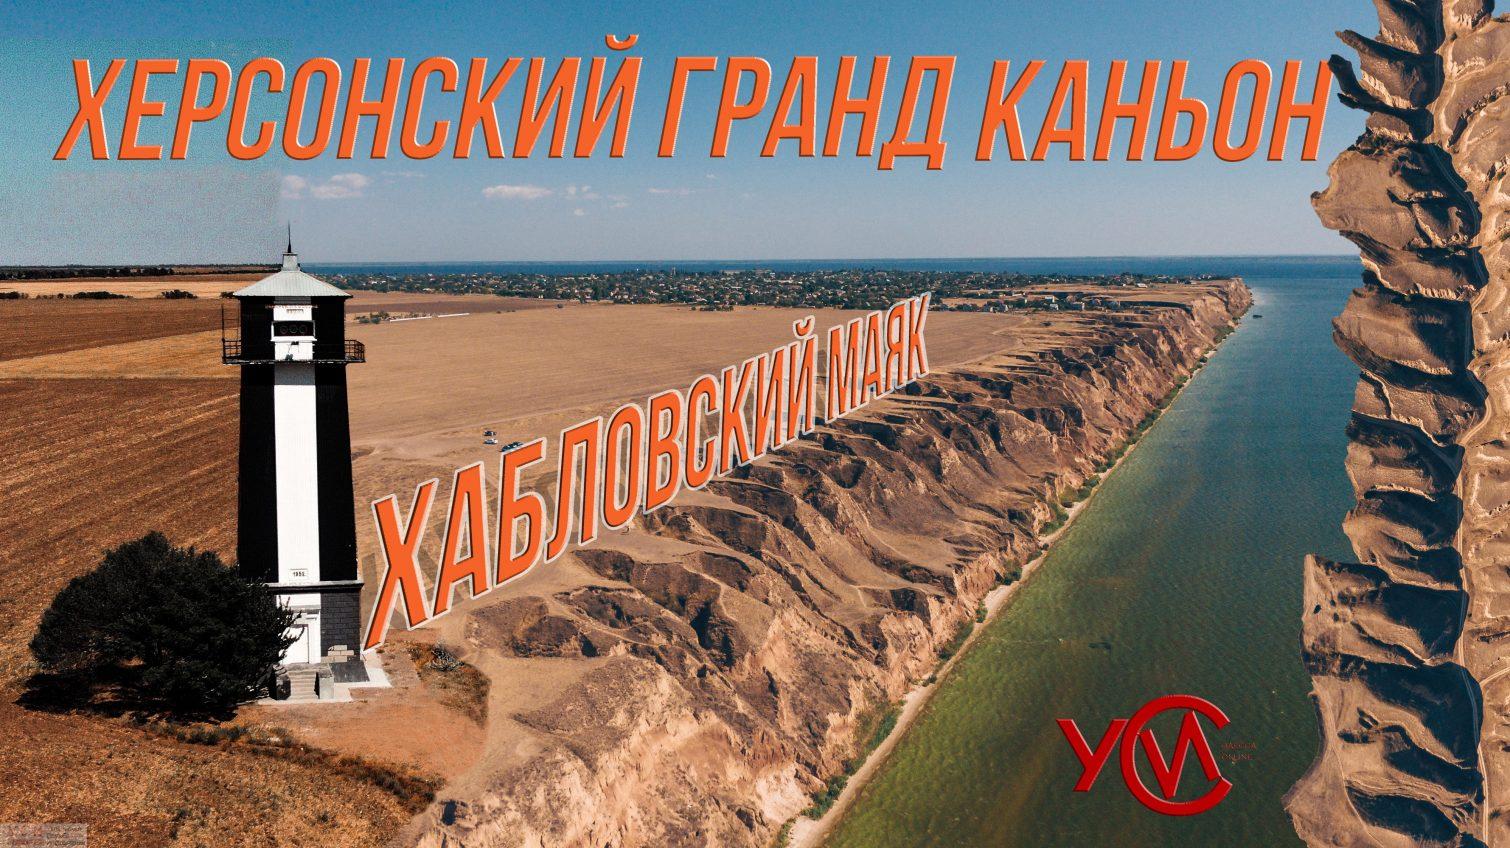 Херсонский Гранд Каньон и маяк в поле: #МандруйУкраїною «фото»